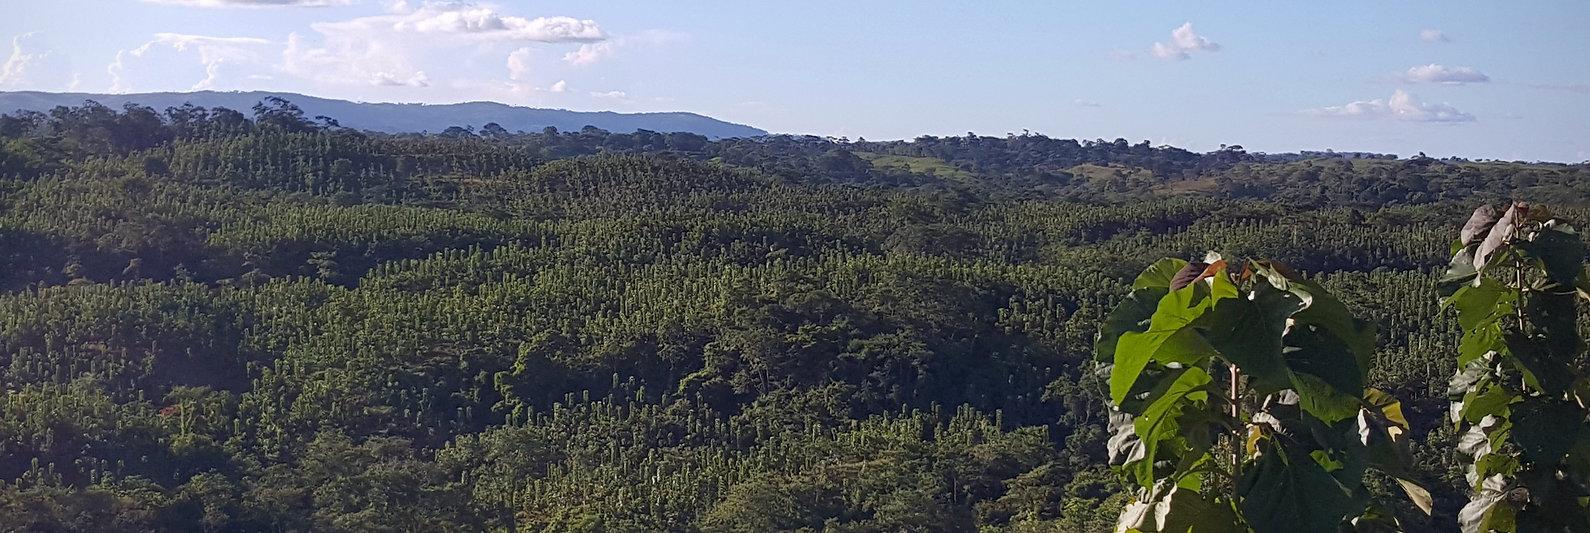 Vista Santa Elena Plantation 2019 (1).jp